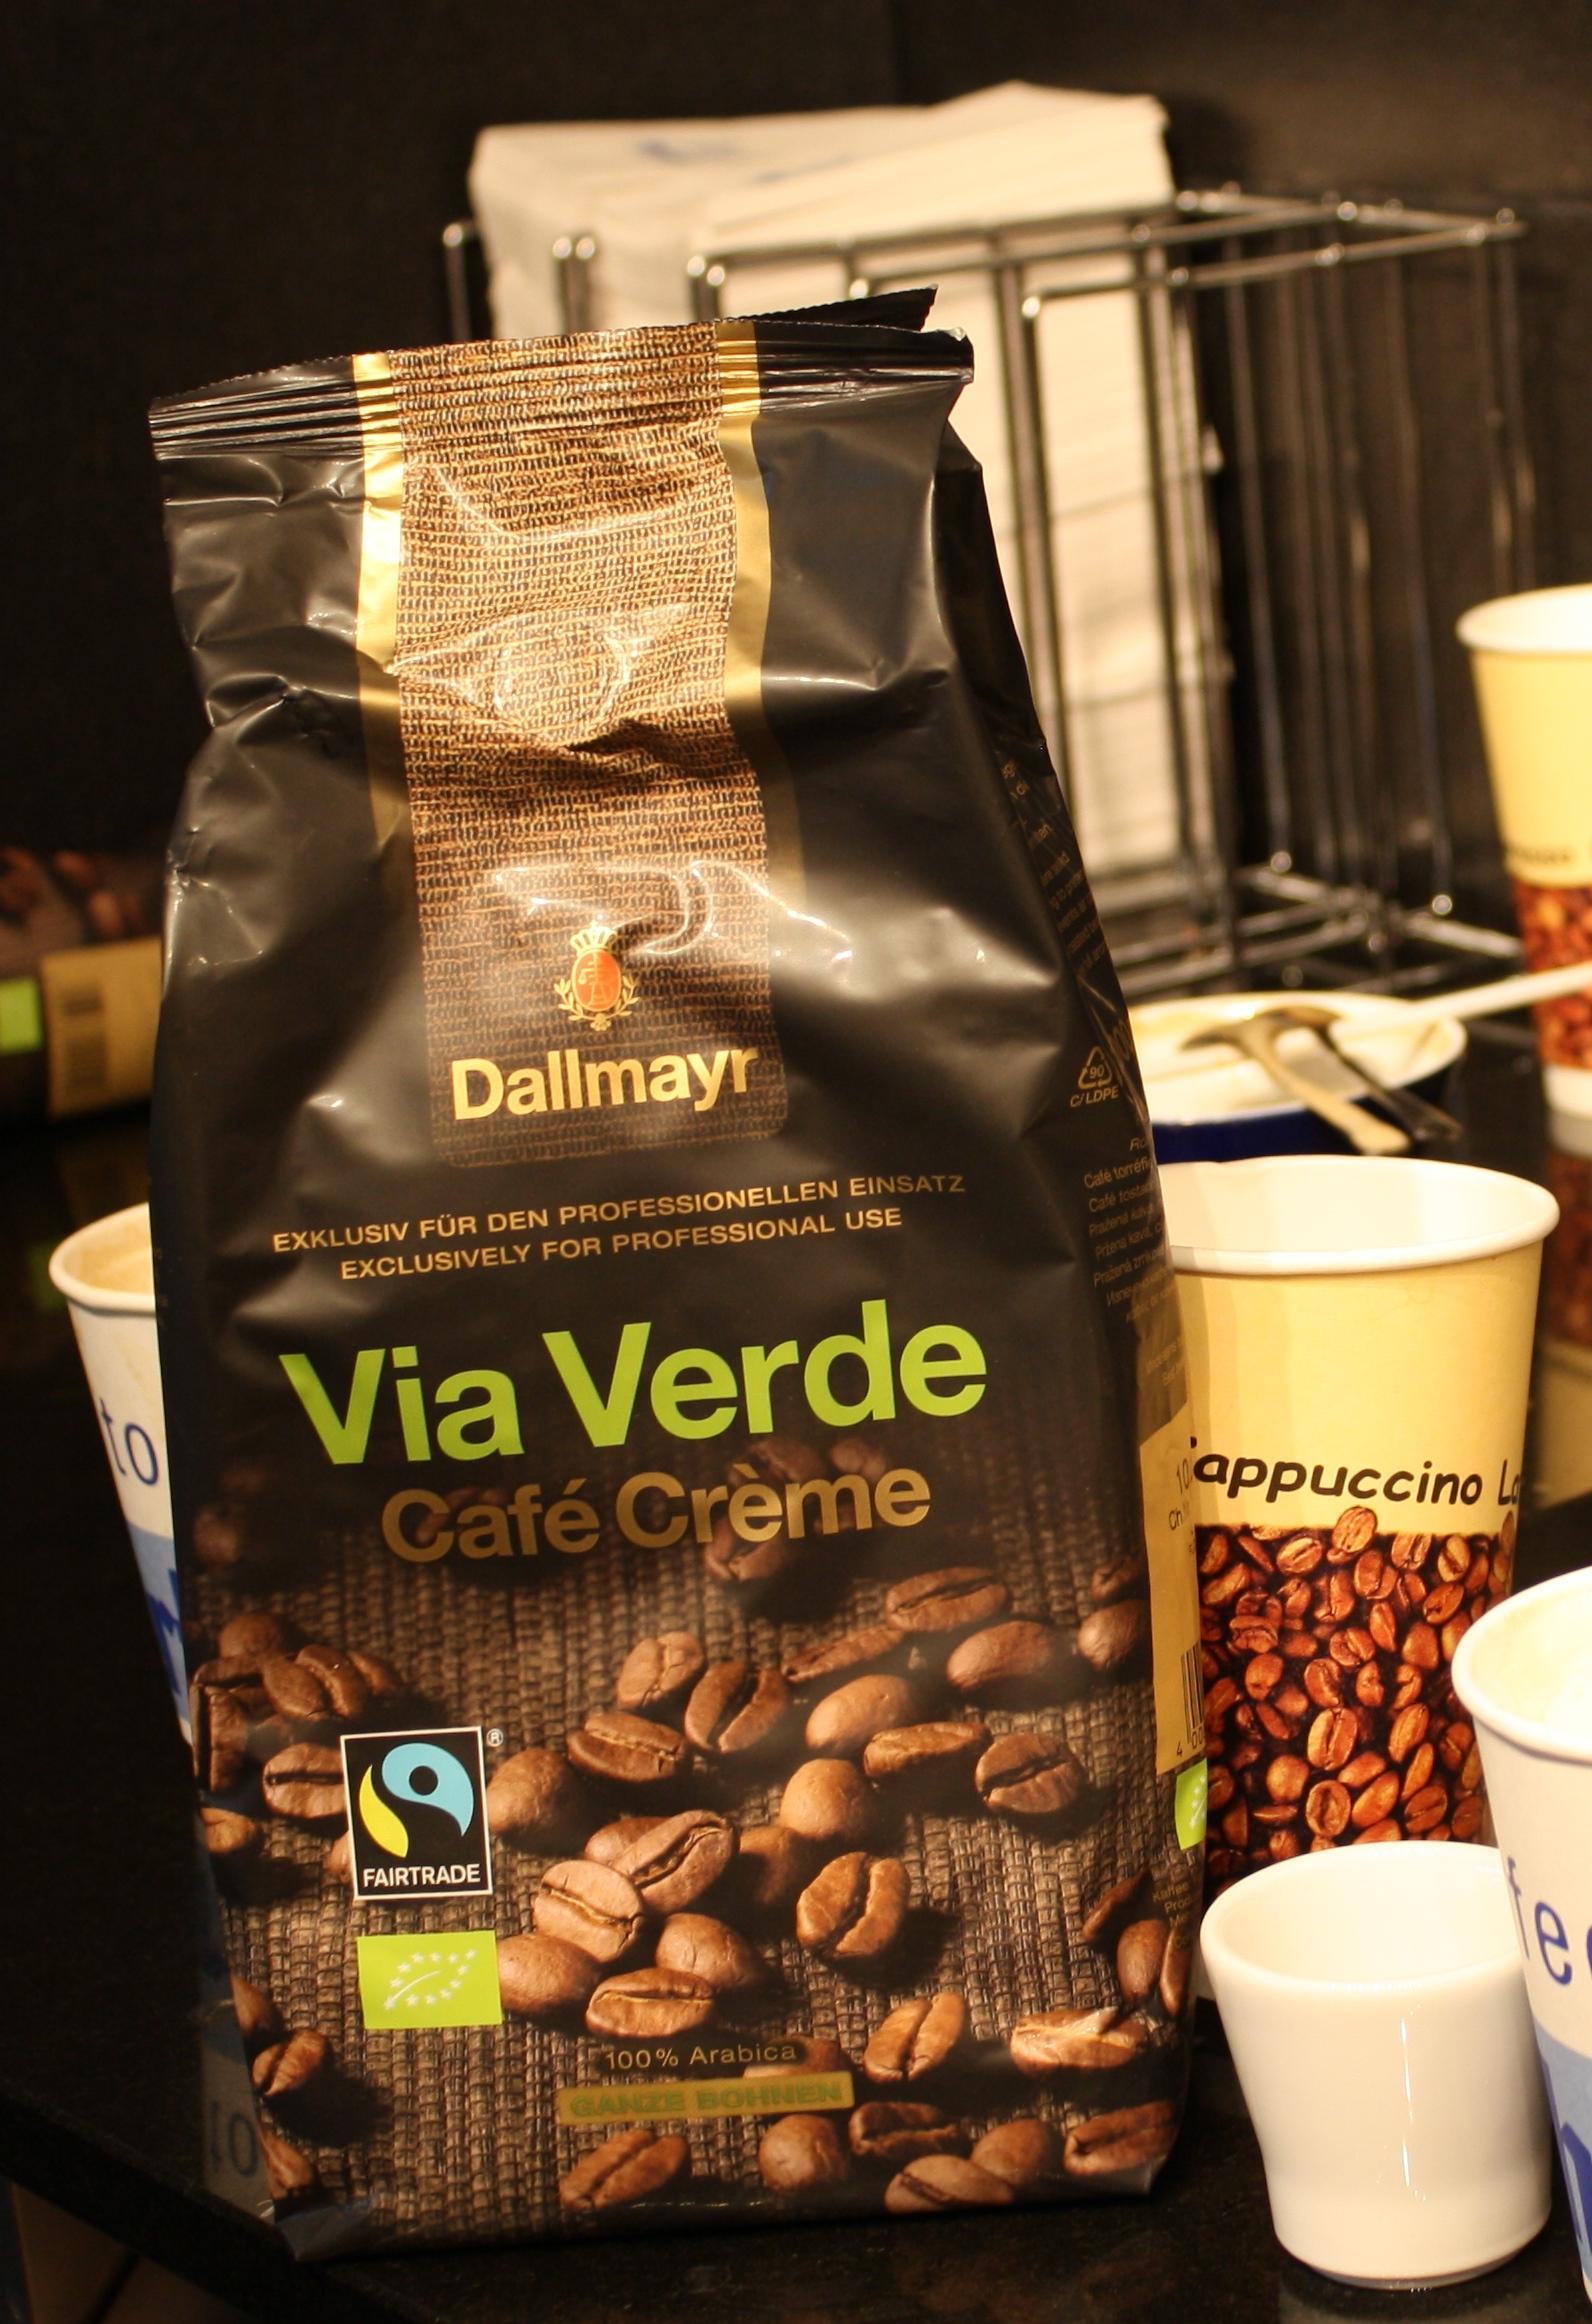 Max RischartDer Schlüssel zu gutem Bio Fairtrade Kaffee